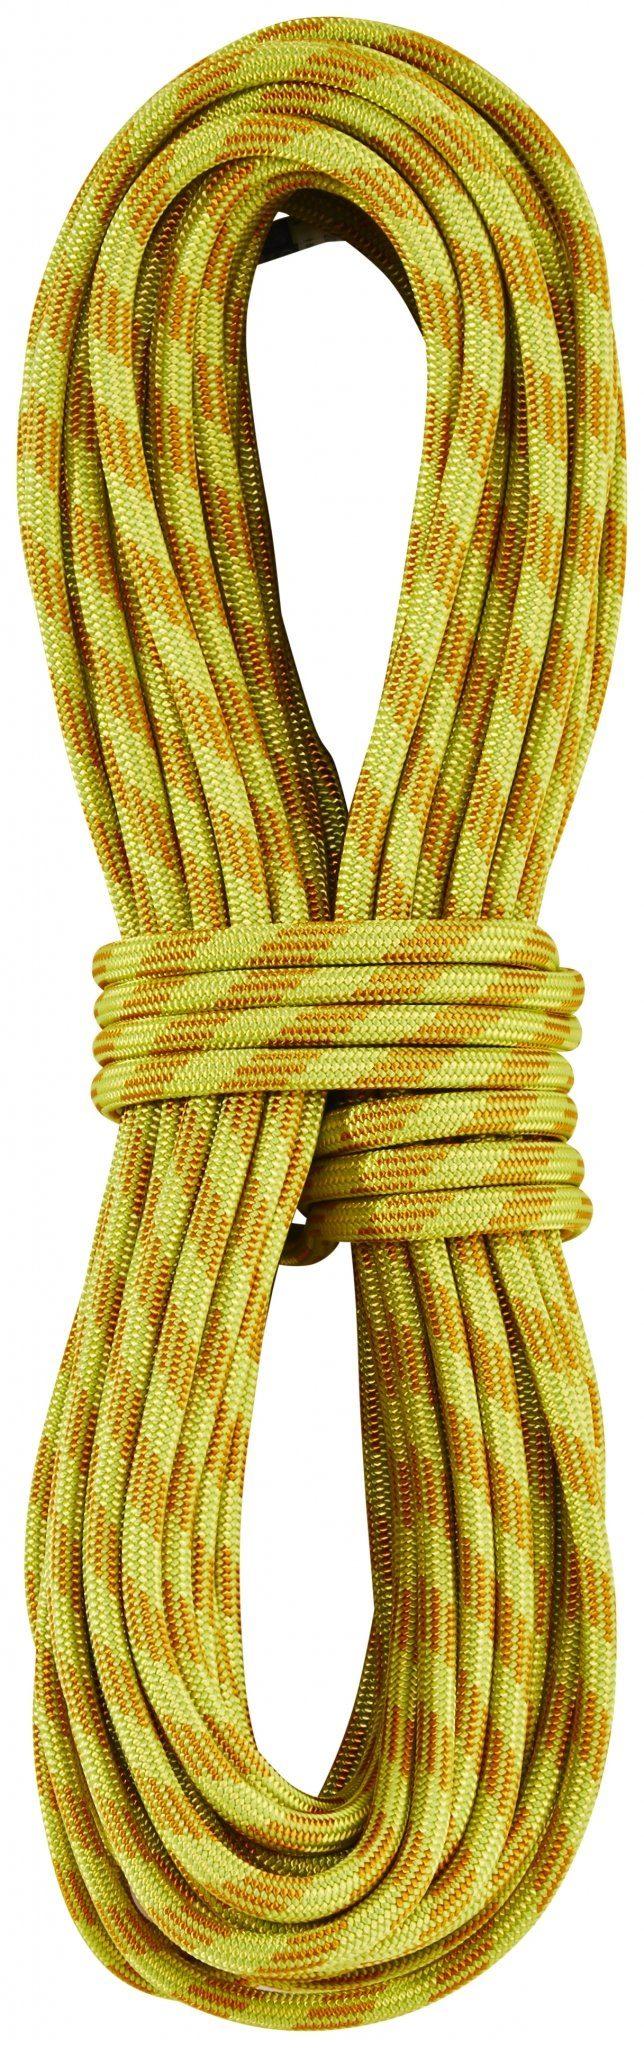 Edelrid Kletterseil »Confidence Rope 8,0mm 30m«